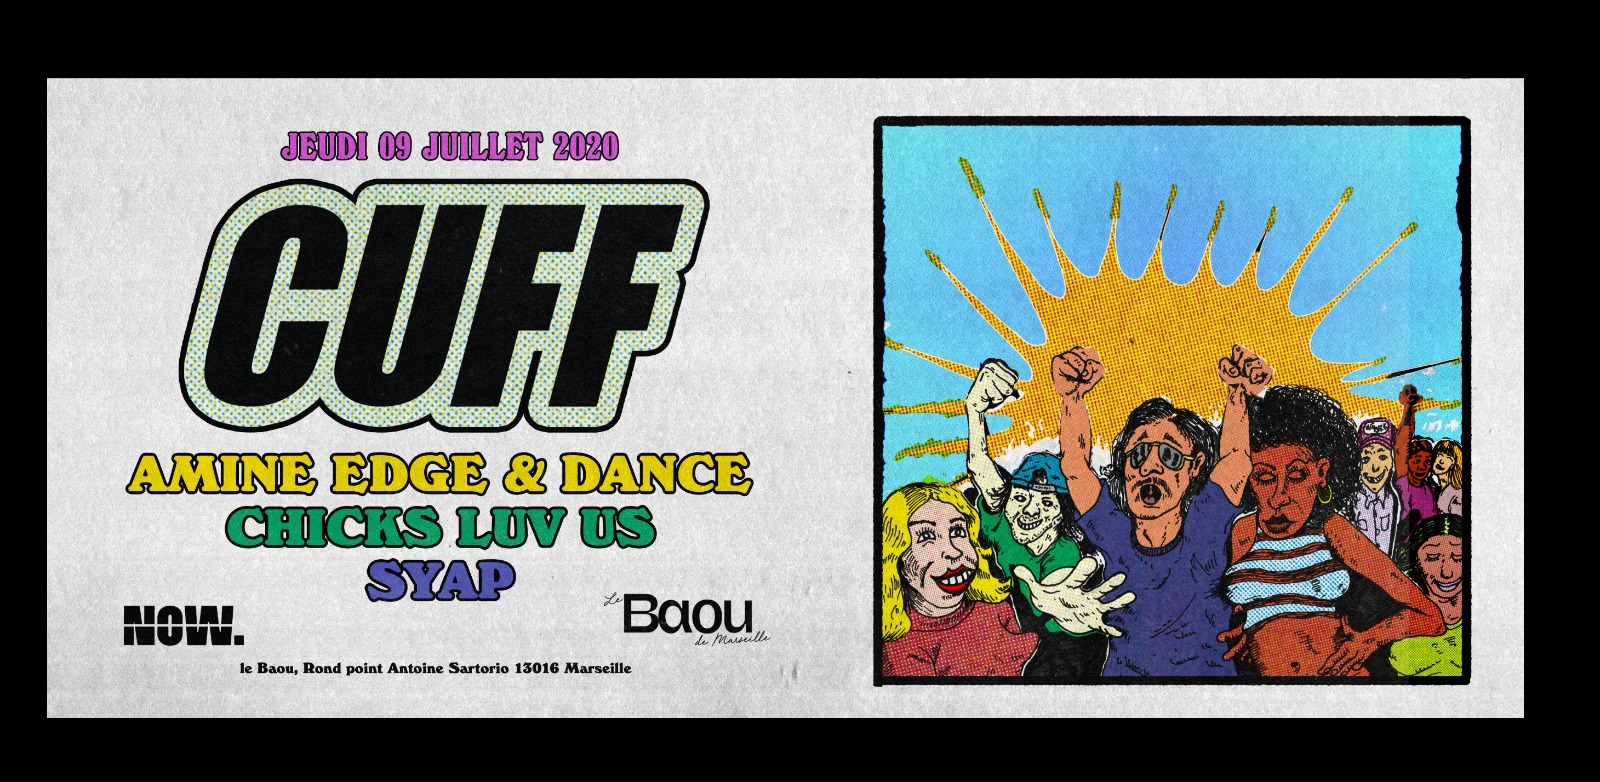 Baou : CUFF x Now. w/ amine edge and dance